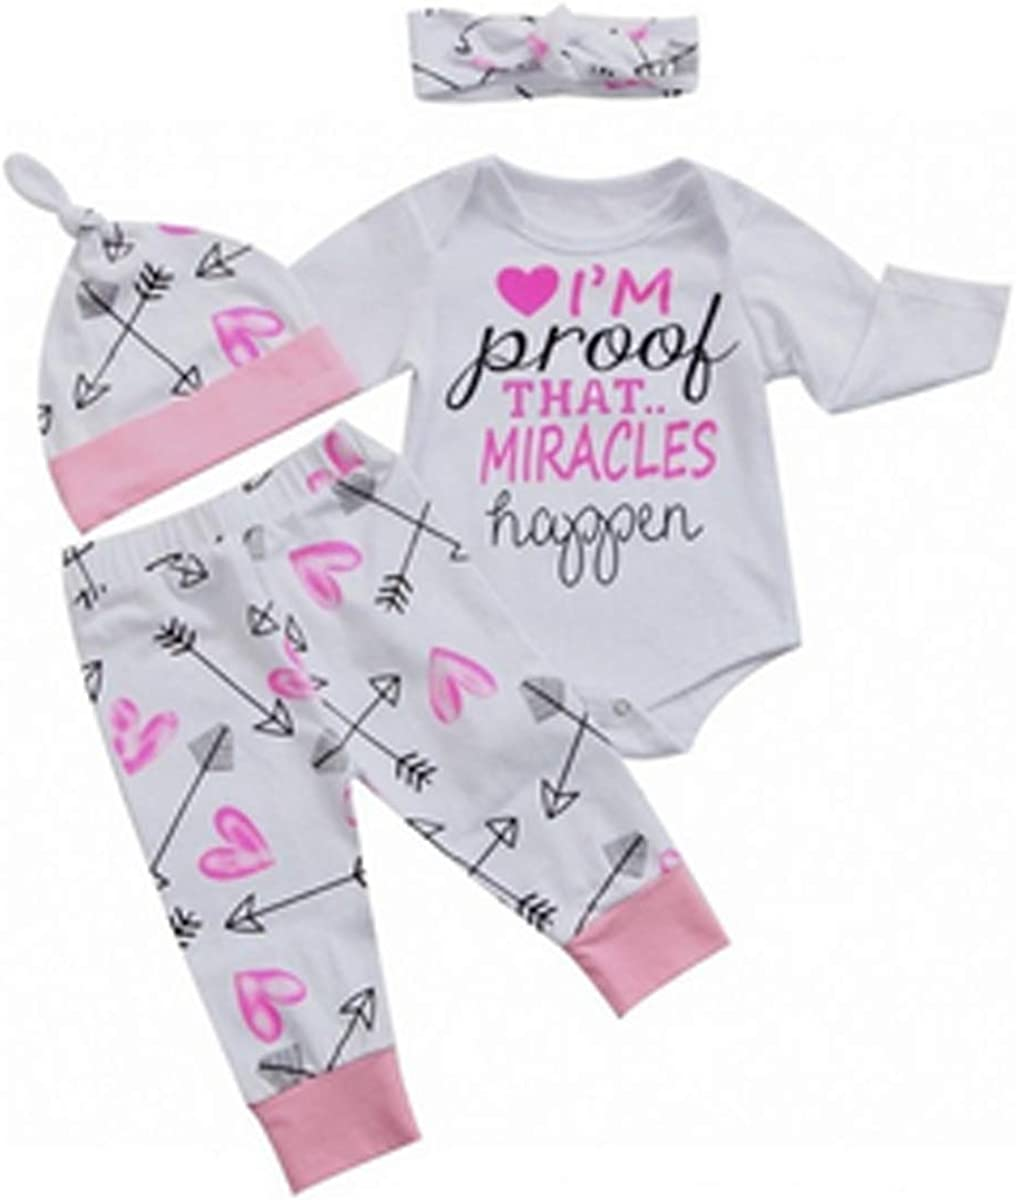 0-3 Months, White Dookingup Newborn Infant Toddler Baby Girls Im Miracles Print Pink Arrow Pattern Pants Romper Bodysuit Jumpsuit 4 Piece Outfit Set